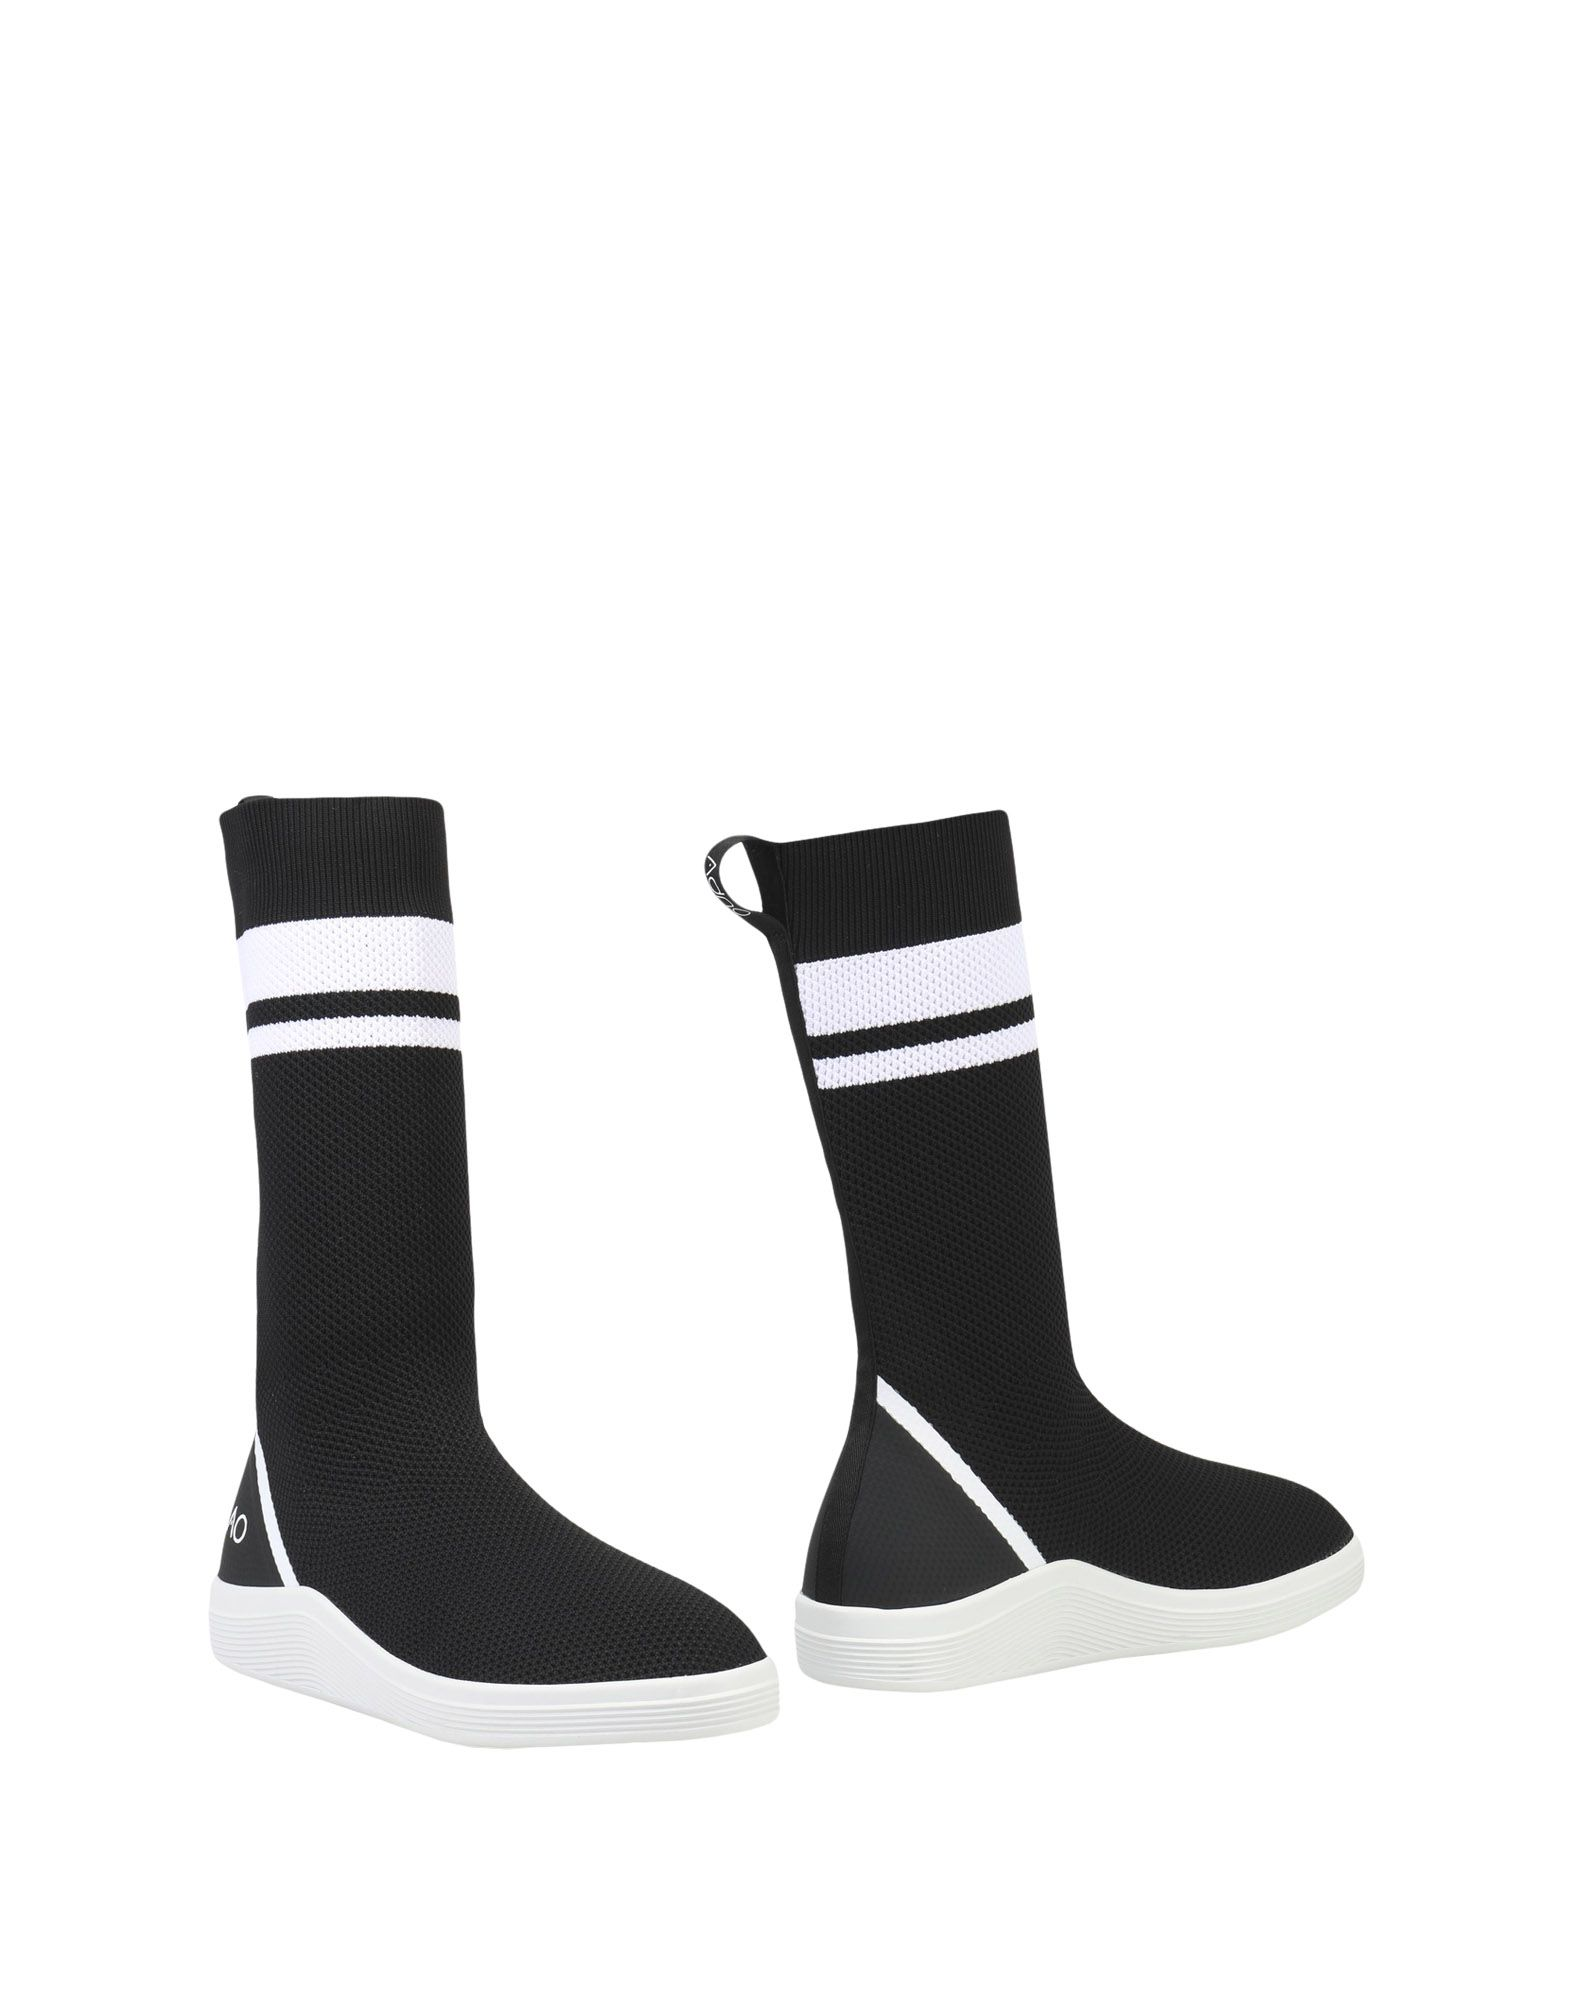 ADNO &Reg; Boots in Black